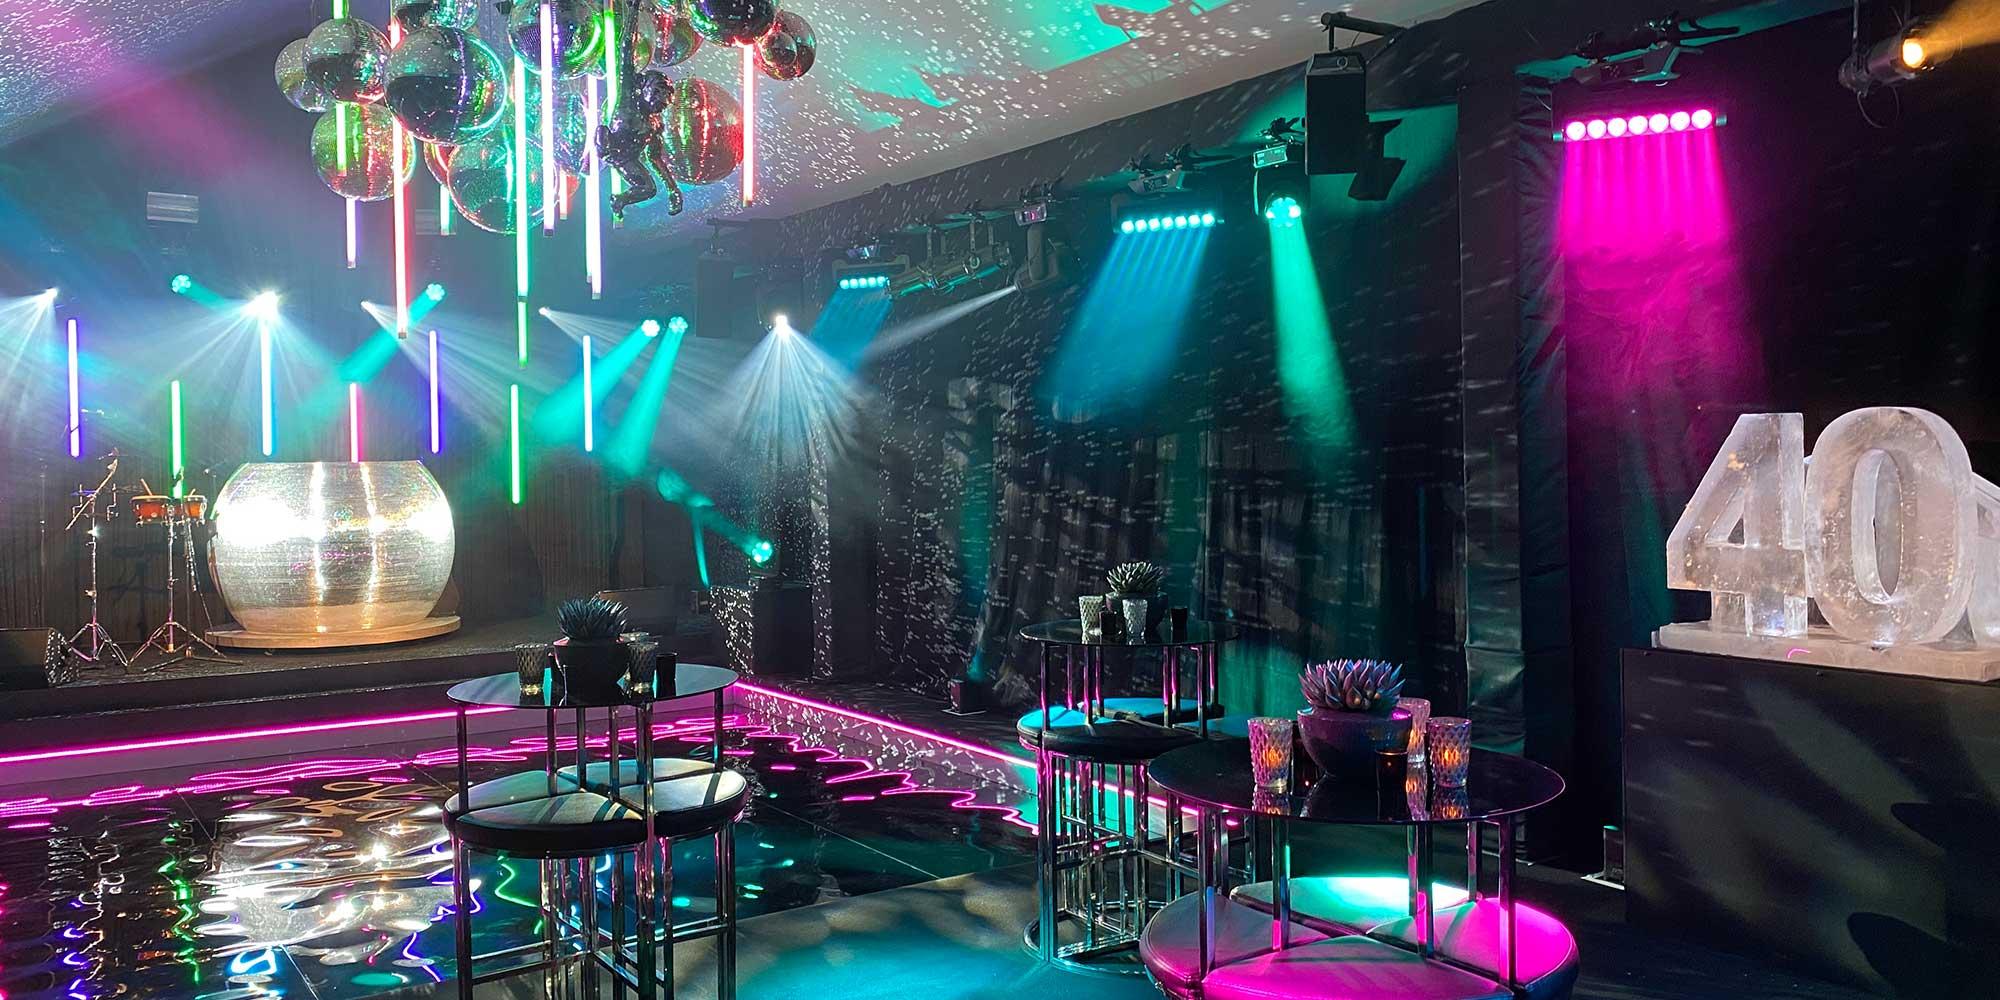 Bespoke Nightclub Birthday Party in Client Basement